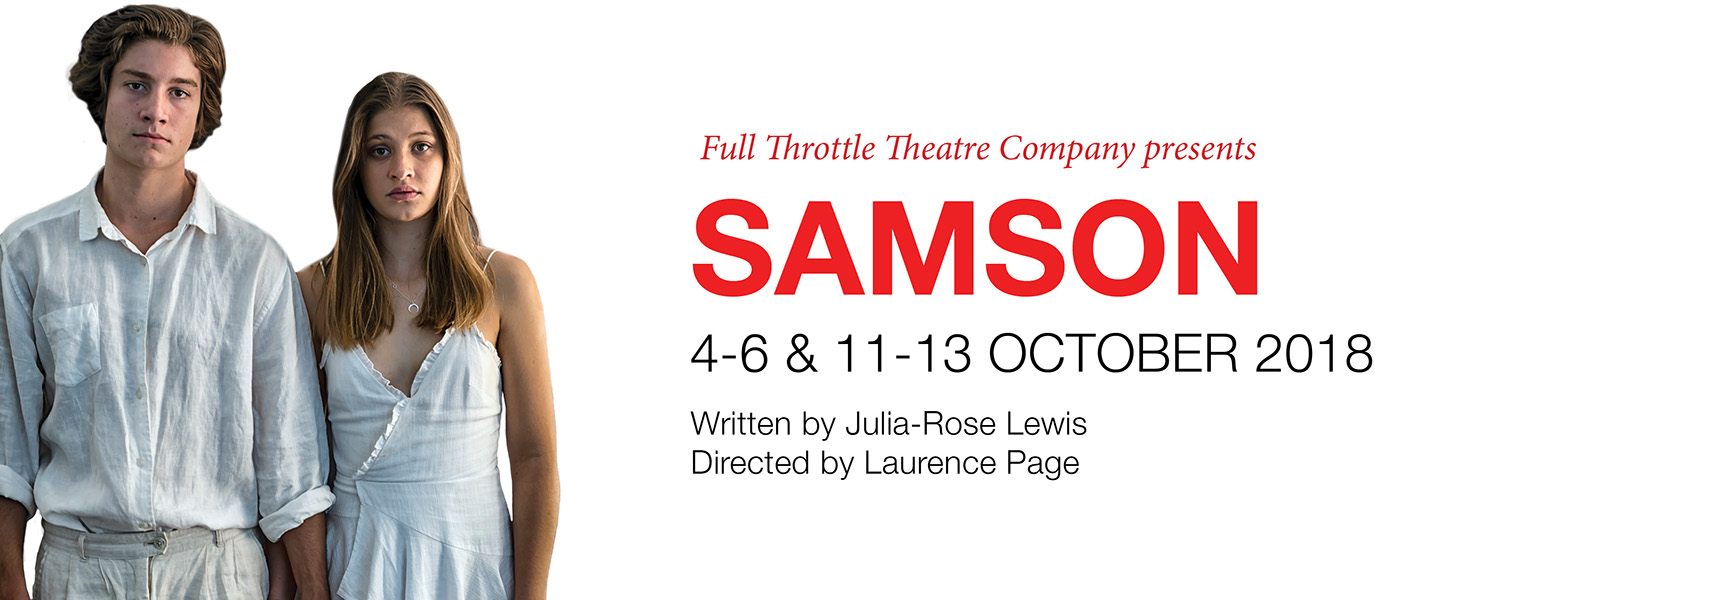 Full Throttle Theatre Company presents: Samson - 4-6 & 11-13 October 2018